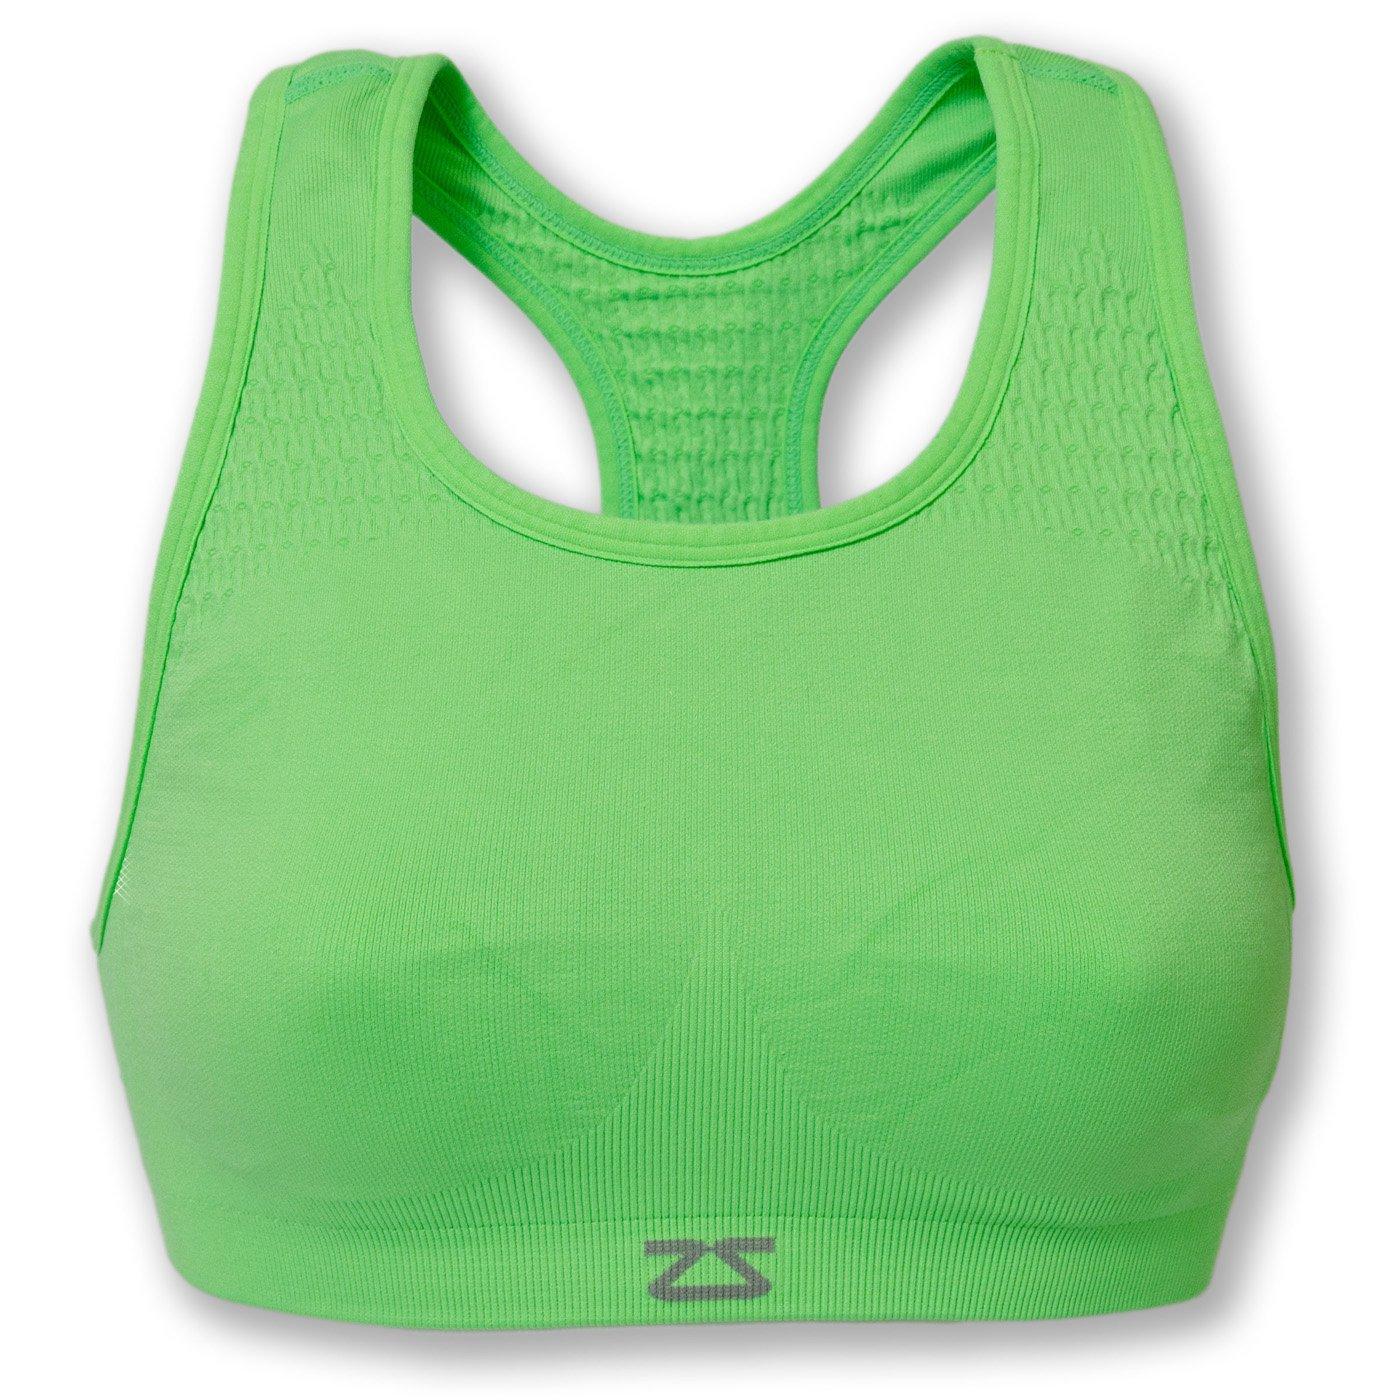 Zensah Seamless Sports Bra - Best Sports Bra for Running, Comfortable Sports Bra,Neon Green,Small/Medium